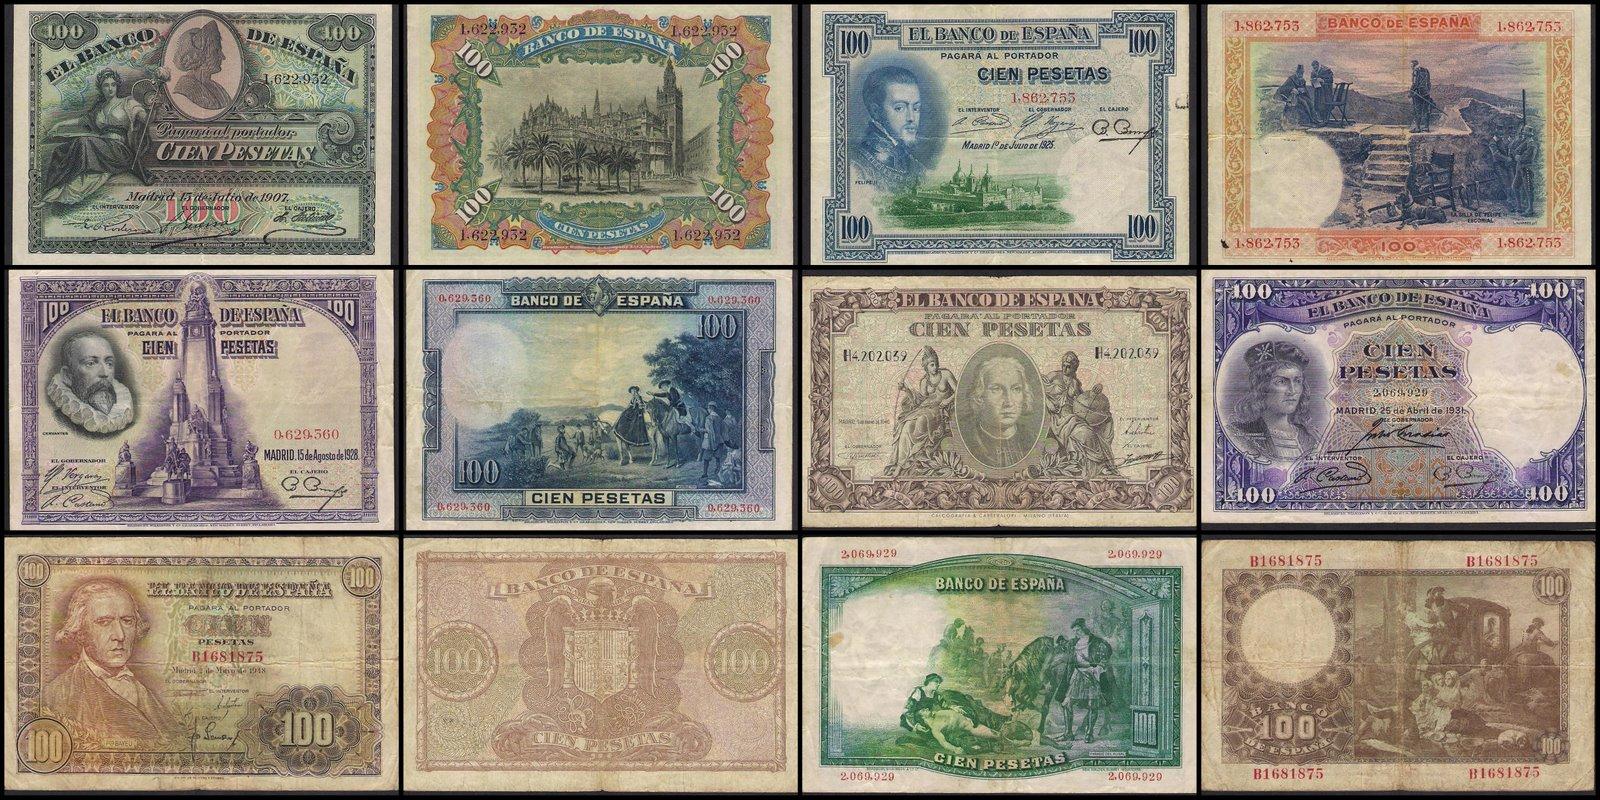 Fotos de billetes de 10000 pesetas 78